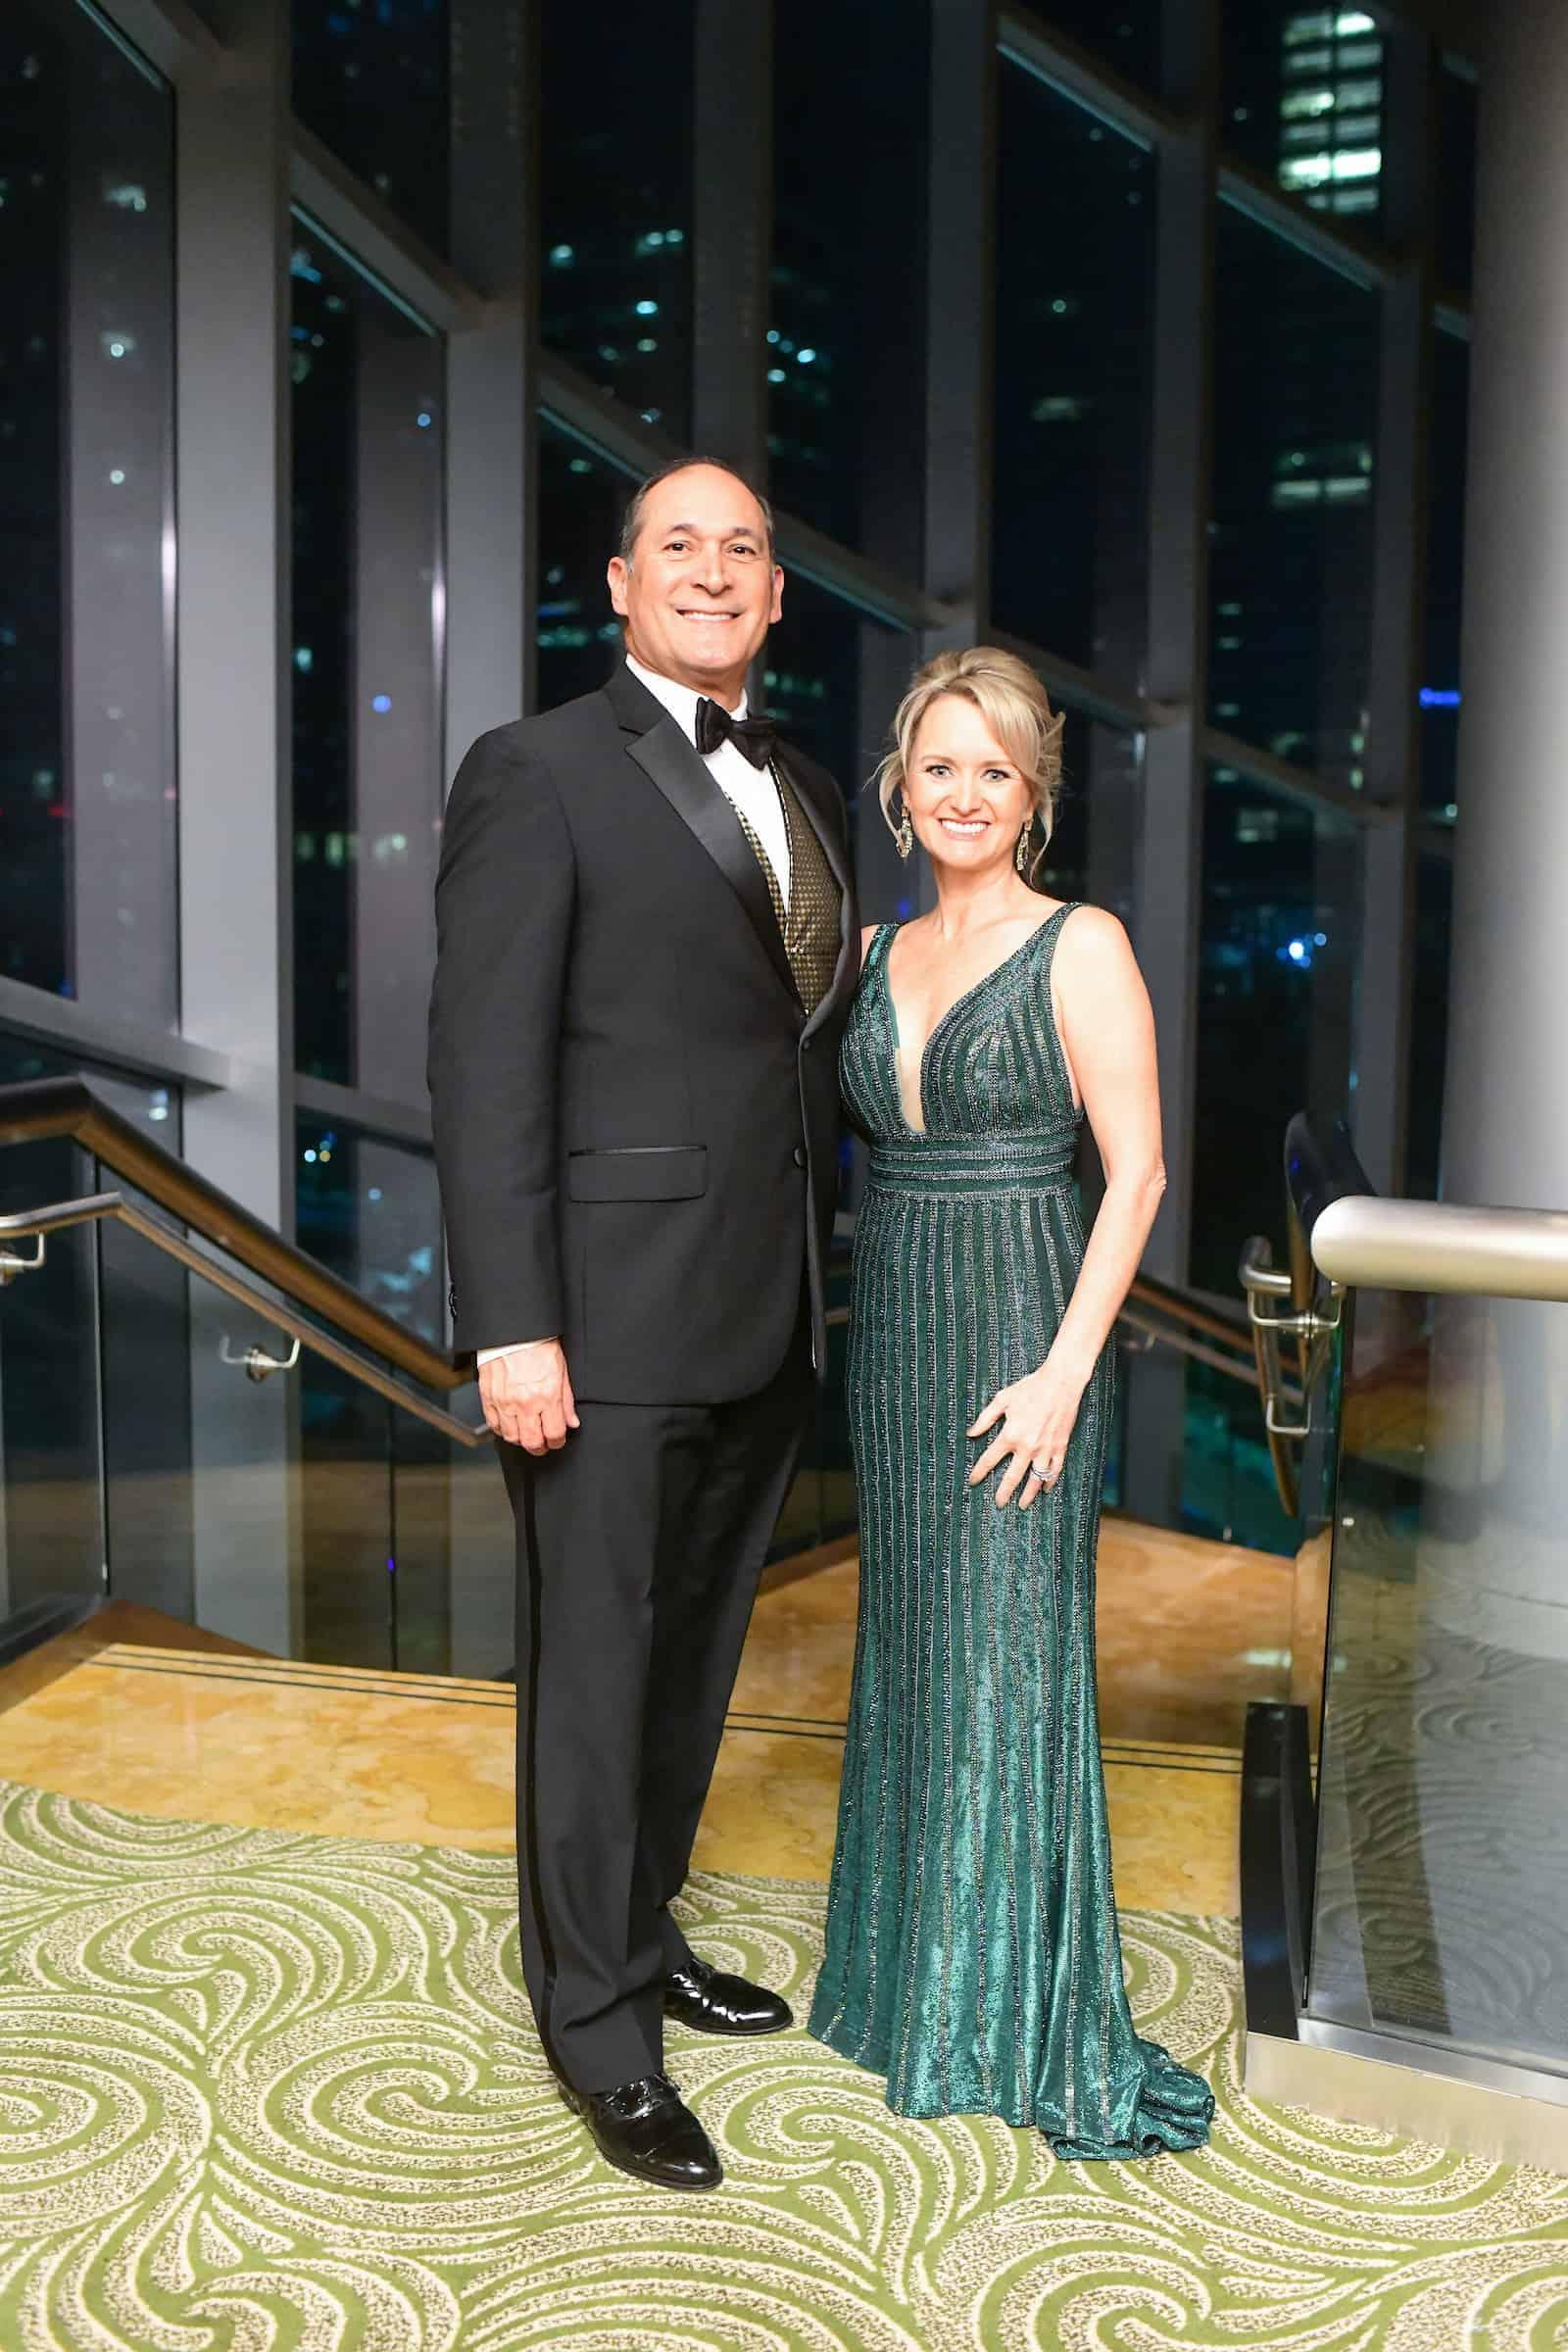 Fernando Parra and Dr Kelly Larkin